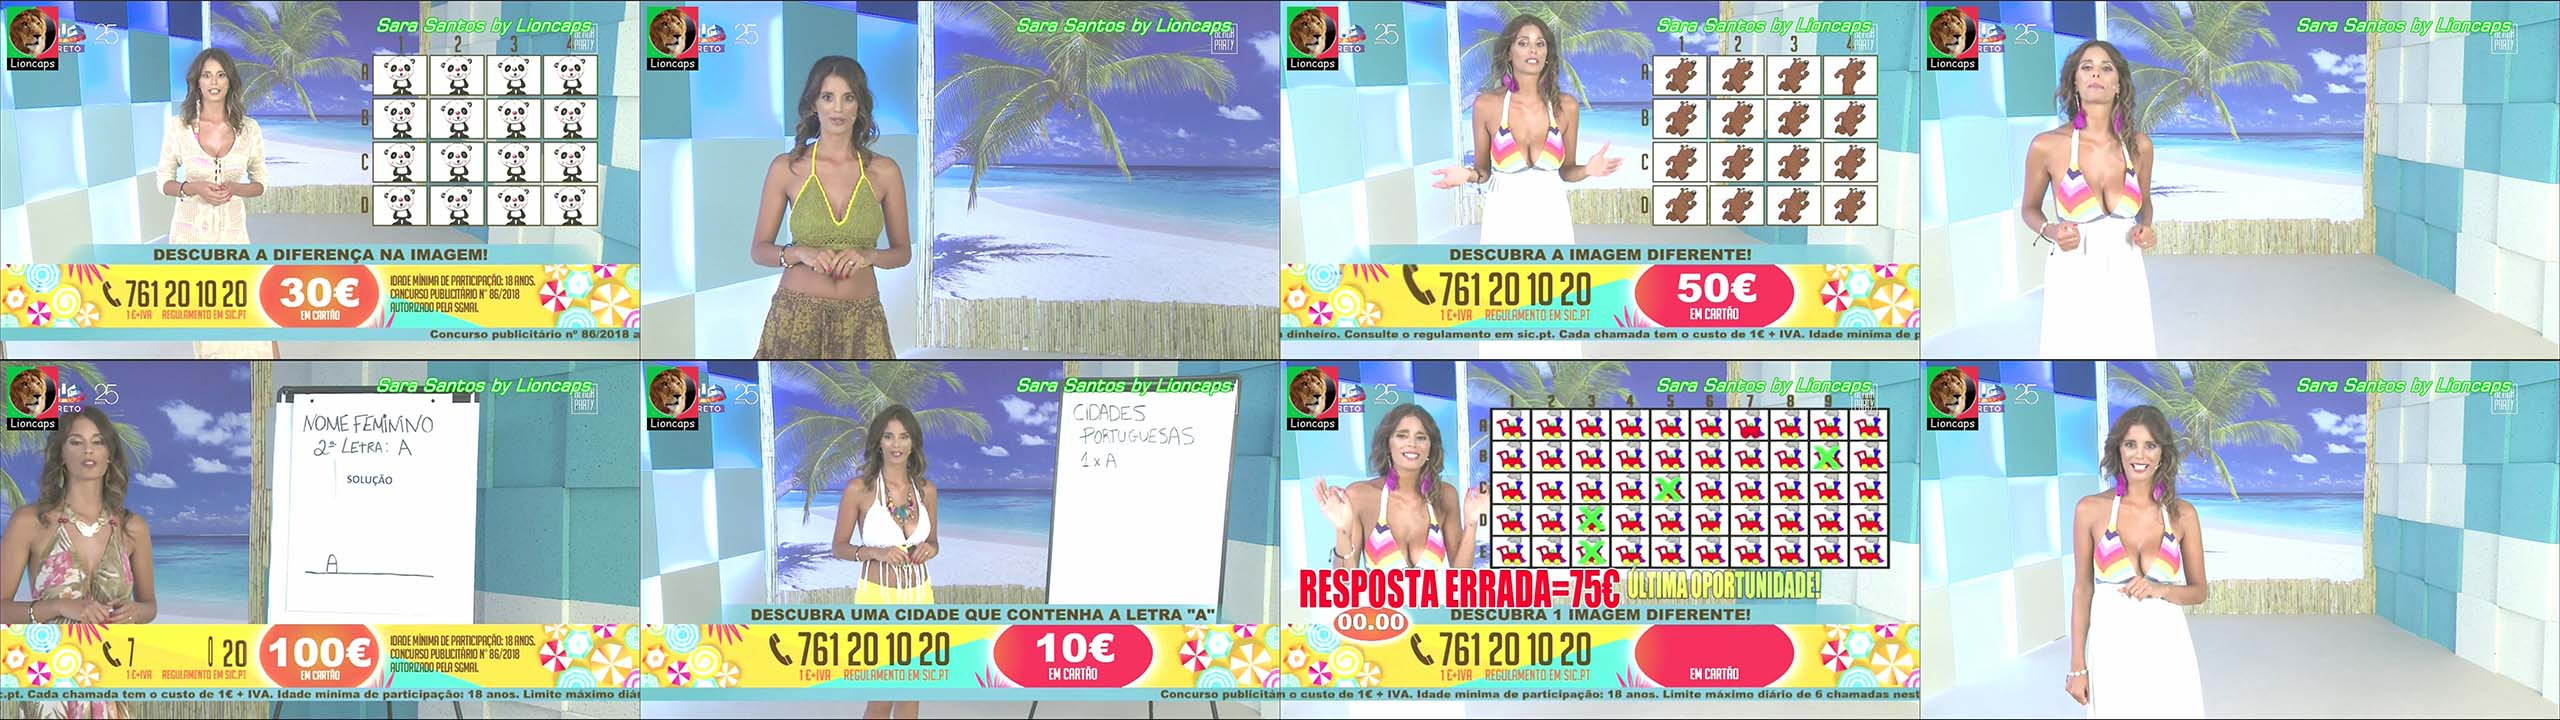 365581285_sara_santos_beach_party_1080_lioncaps_05_08_2018_08_122_49lo.jpg